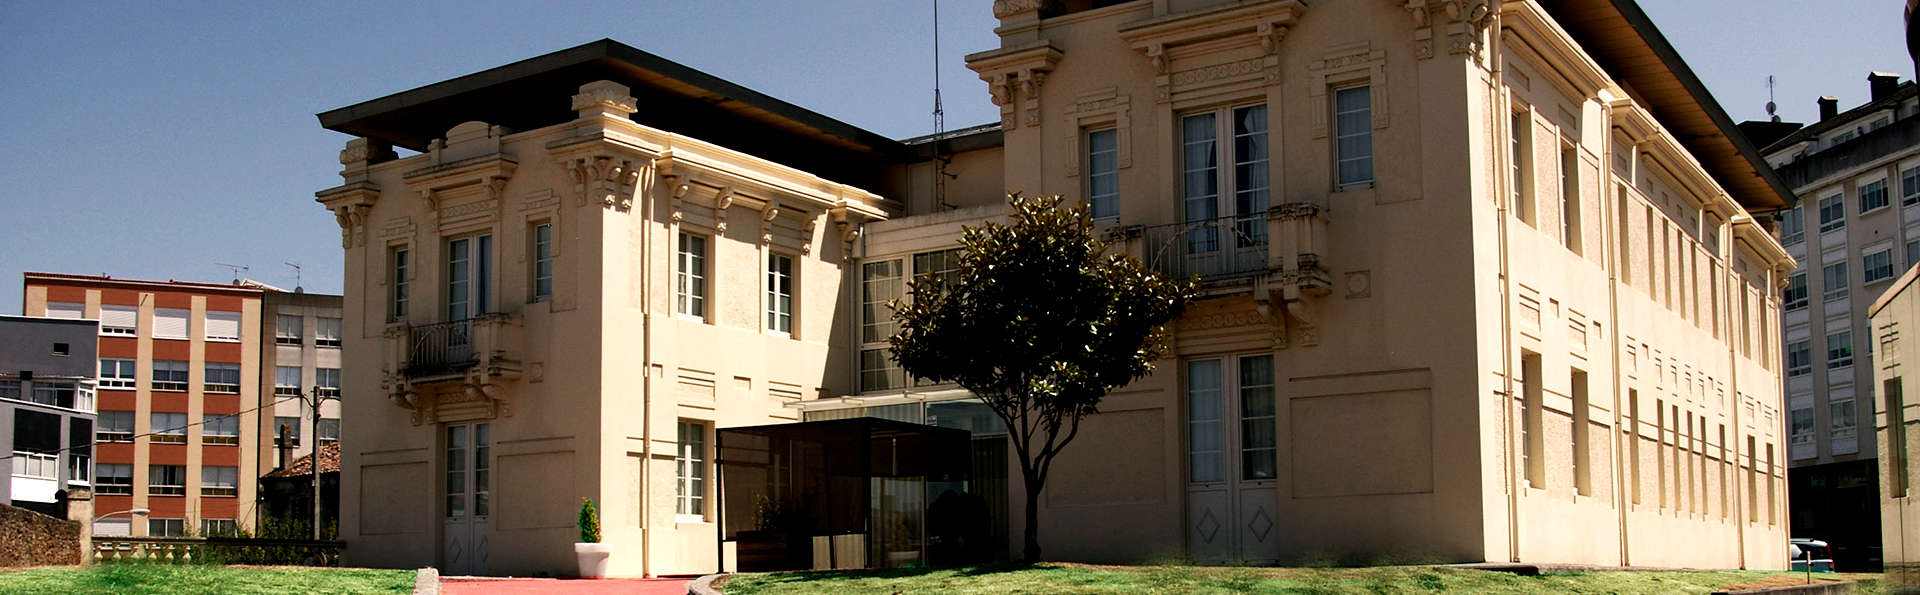 Hotel Villa de Betanzos - Edit_destination.jpg